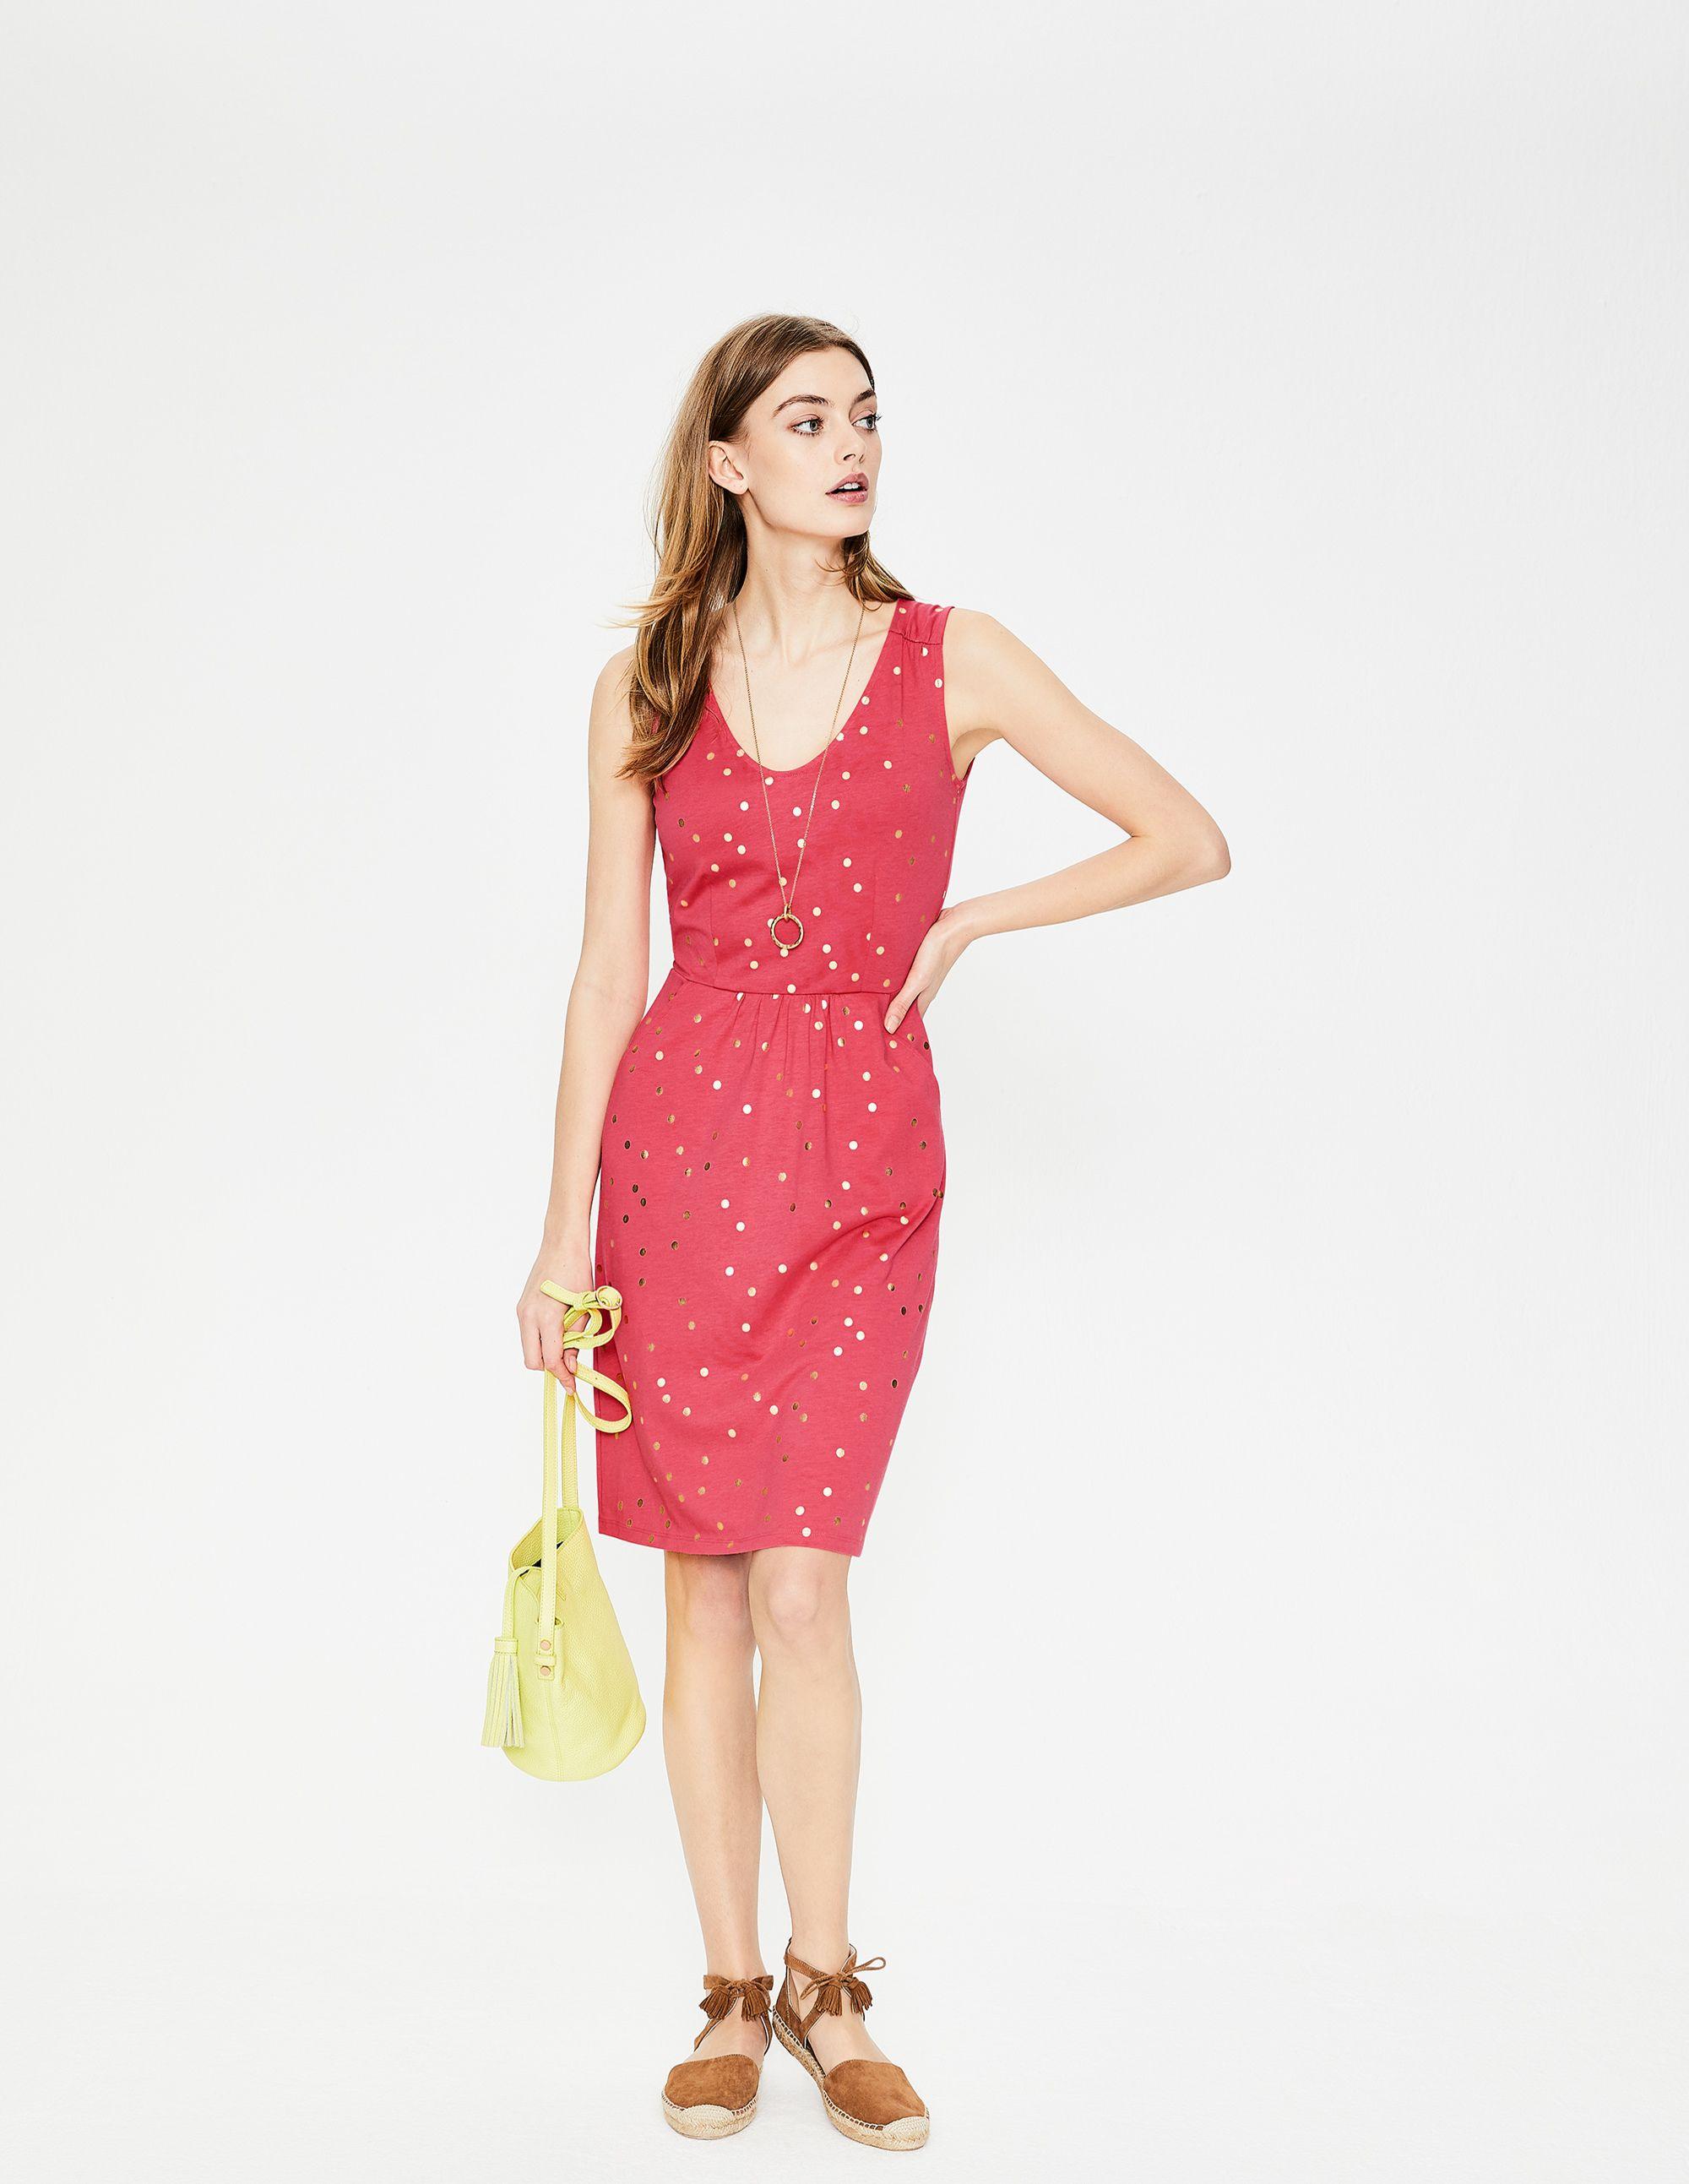 e3269a39f991 Melinda Jersey Dress J0185 Dresses at Boden - size 6R